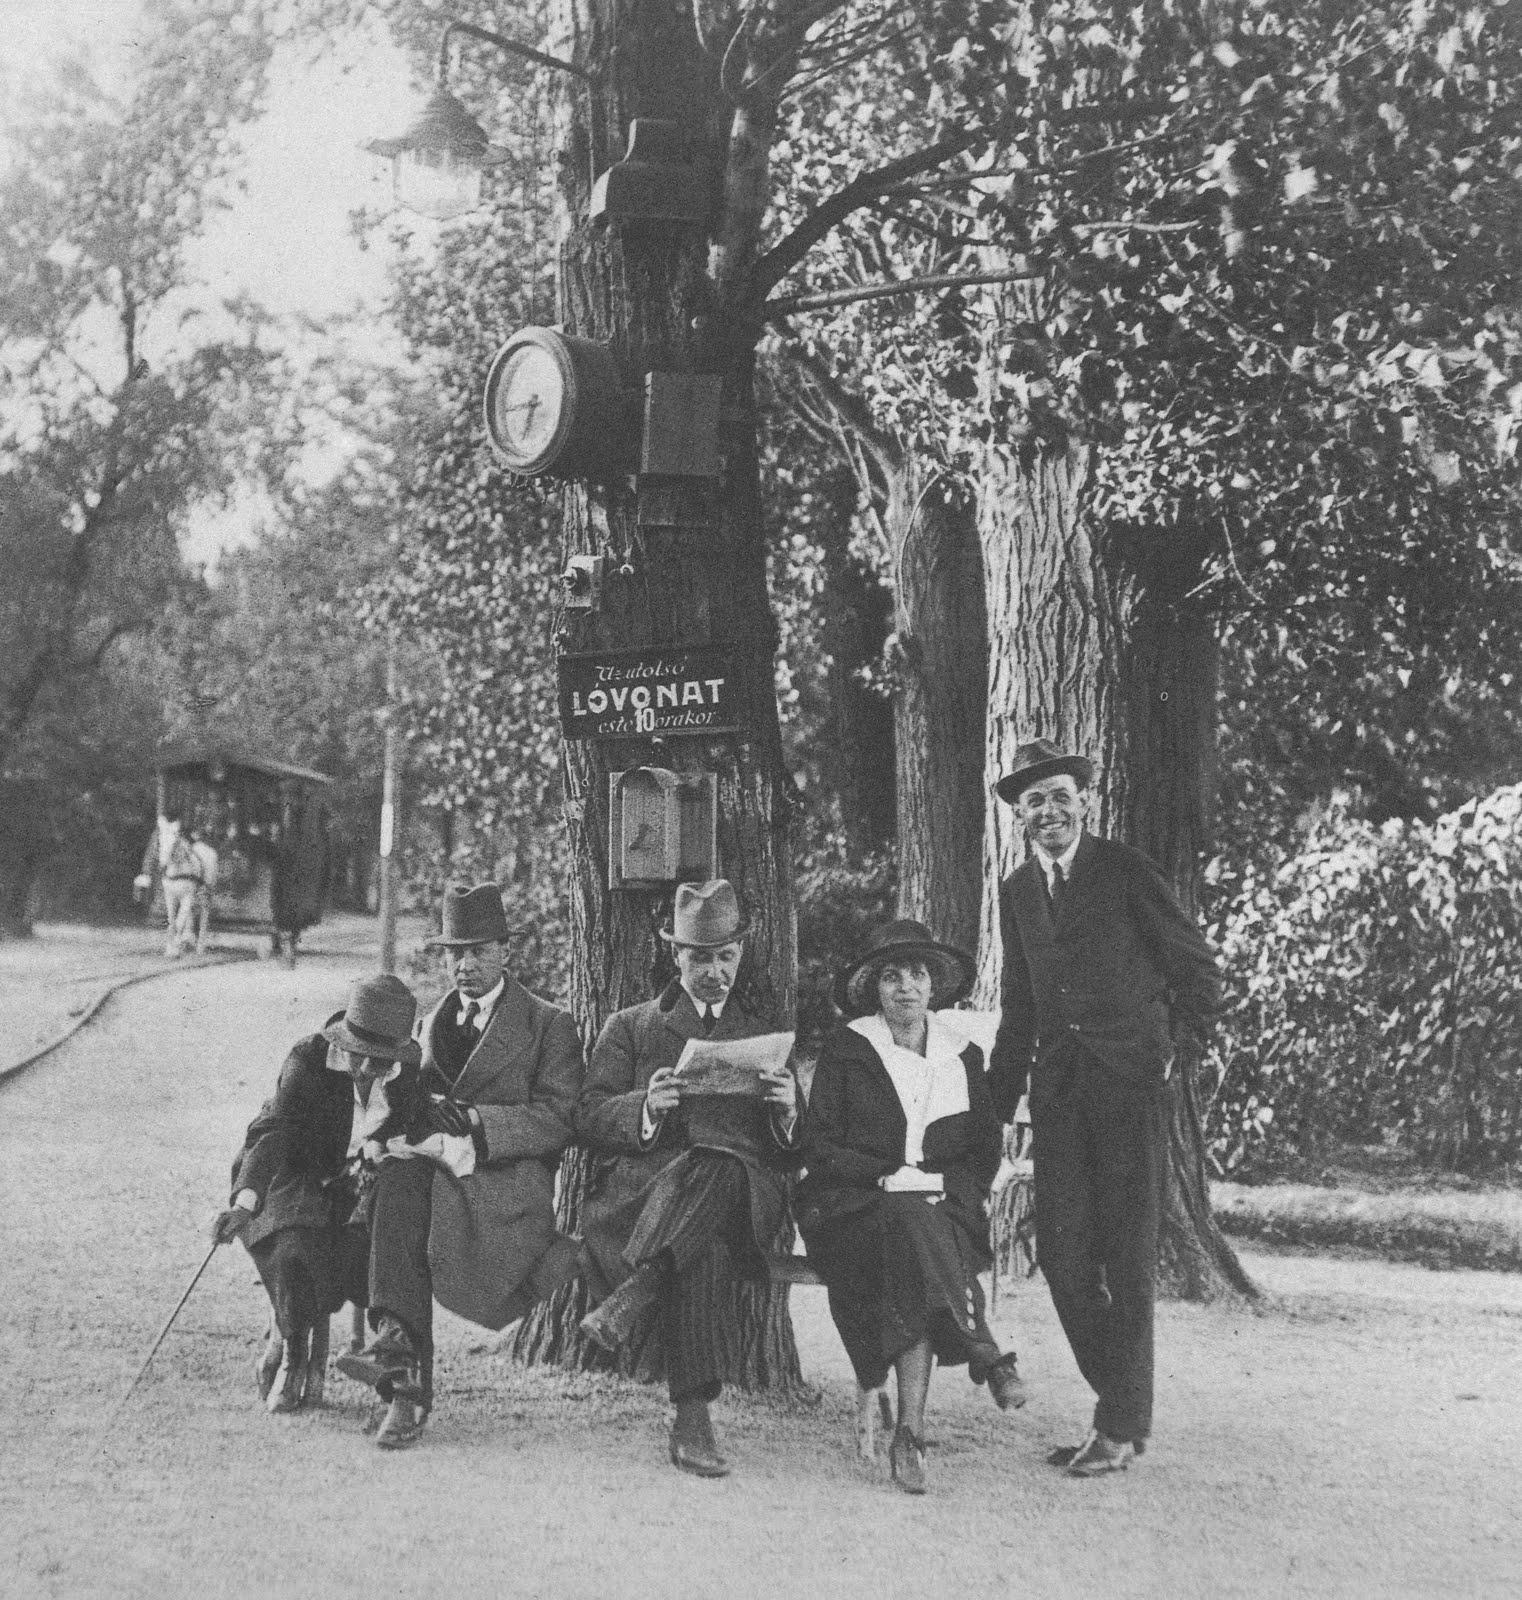 1920. Lóvasút Budapest Margit-sziget.jpg